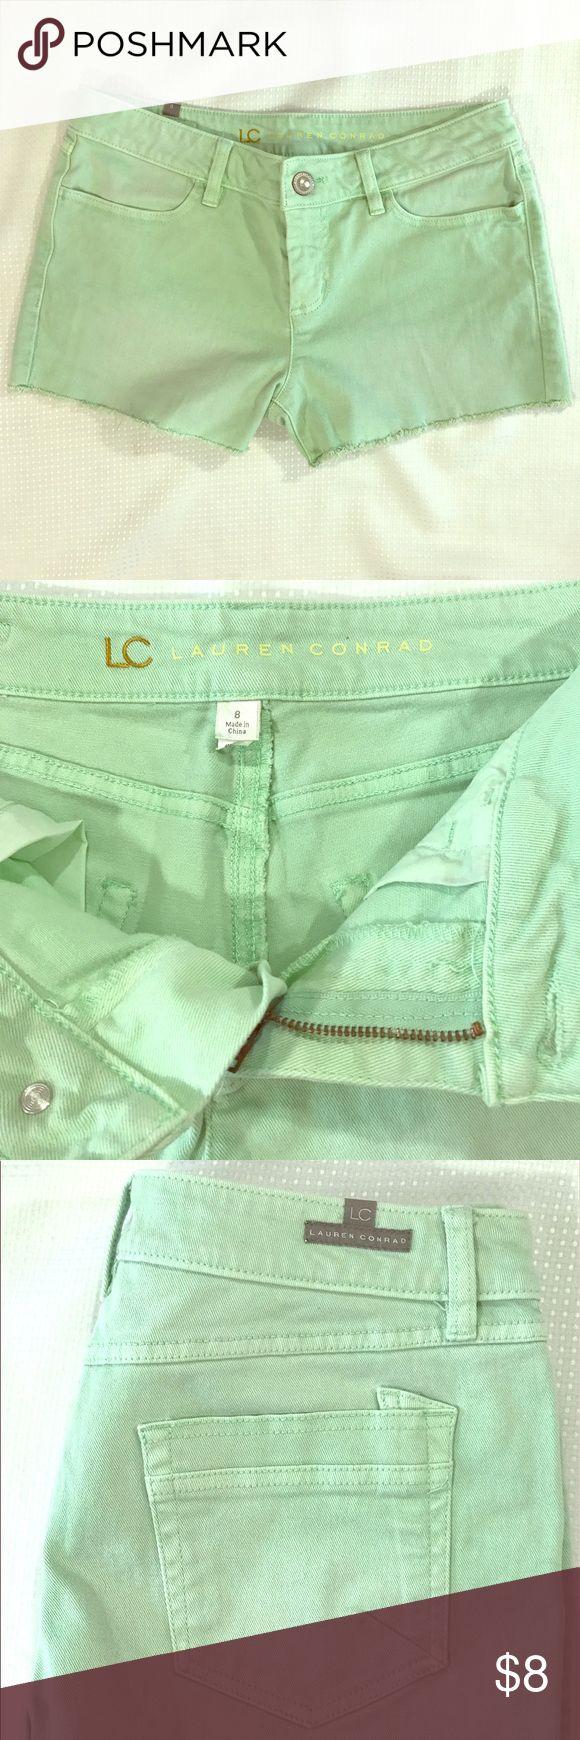 "Sz 8 Lauren Conrad Fringe Dyed Cutoff Jean Shorts Sz 8 Lauren Conrad Fringe Light Green Dyed Cutoff Jean Shorts 11"" Length, 16"" Waist, 9"" Rise. Lauren Conrad  Shorts Jean Shorts"